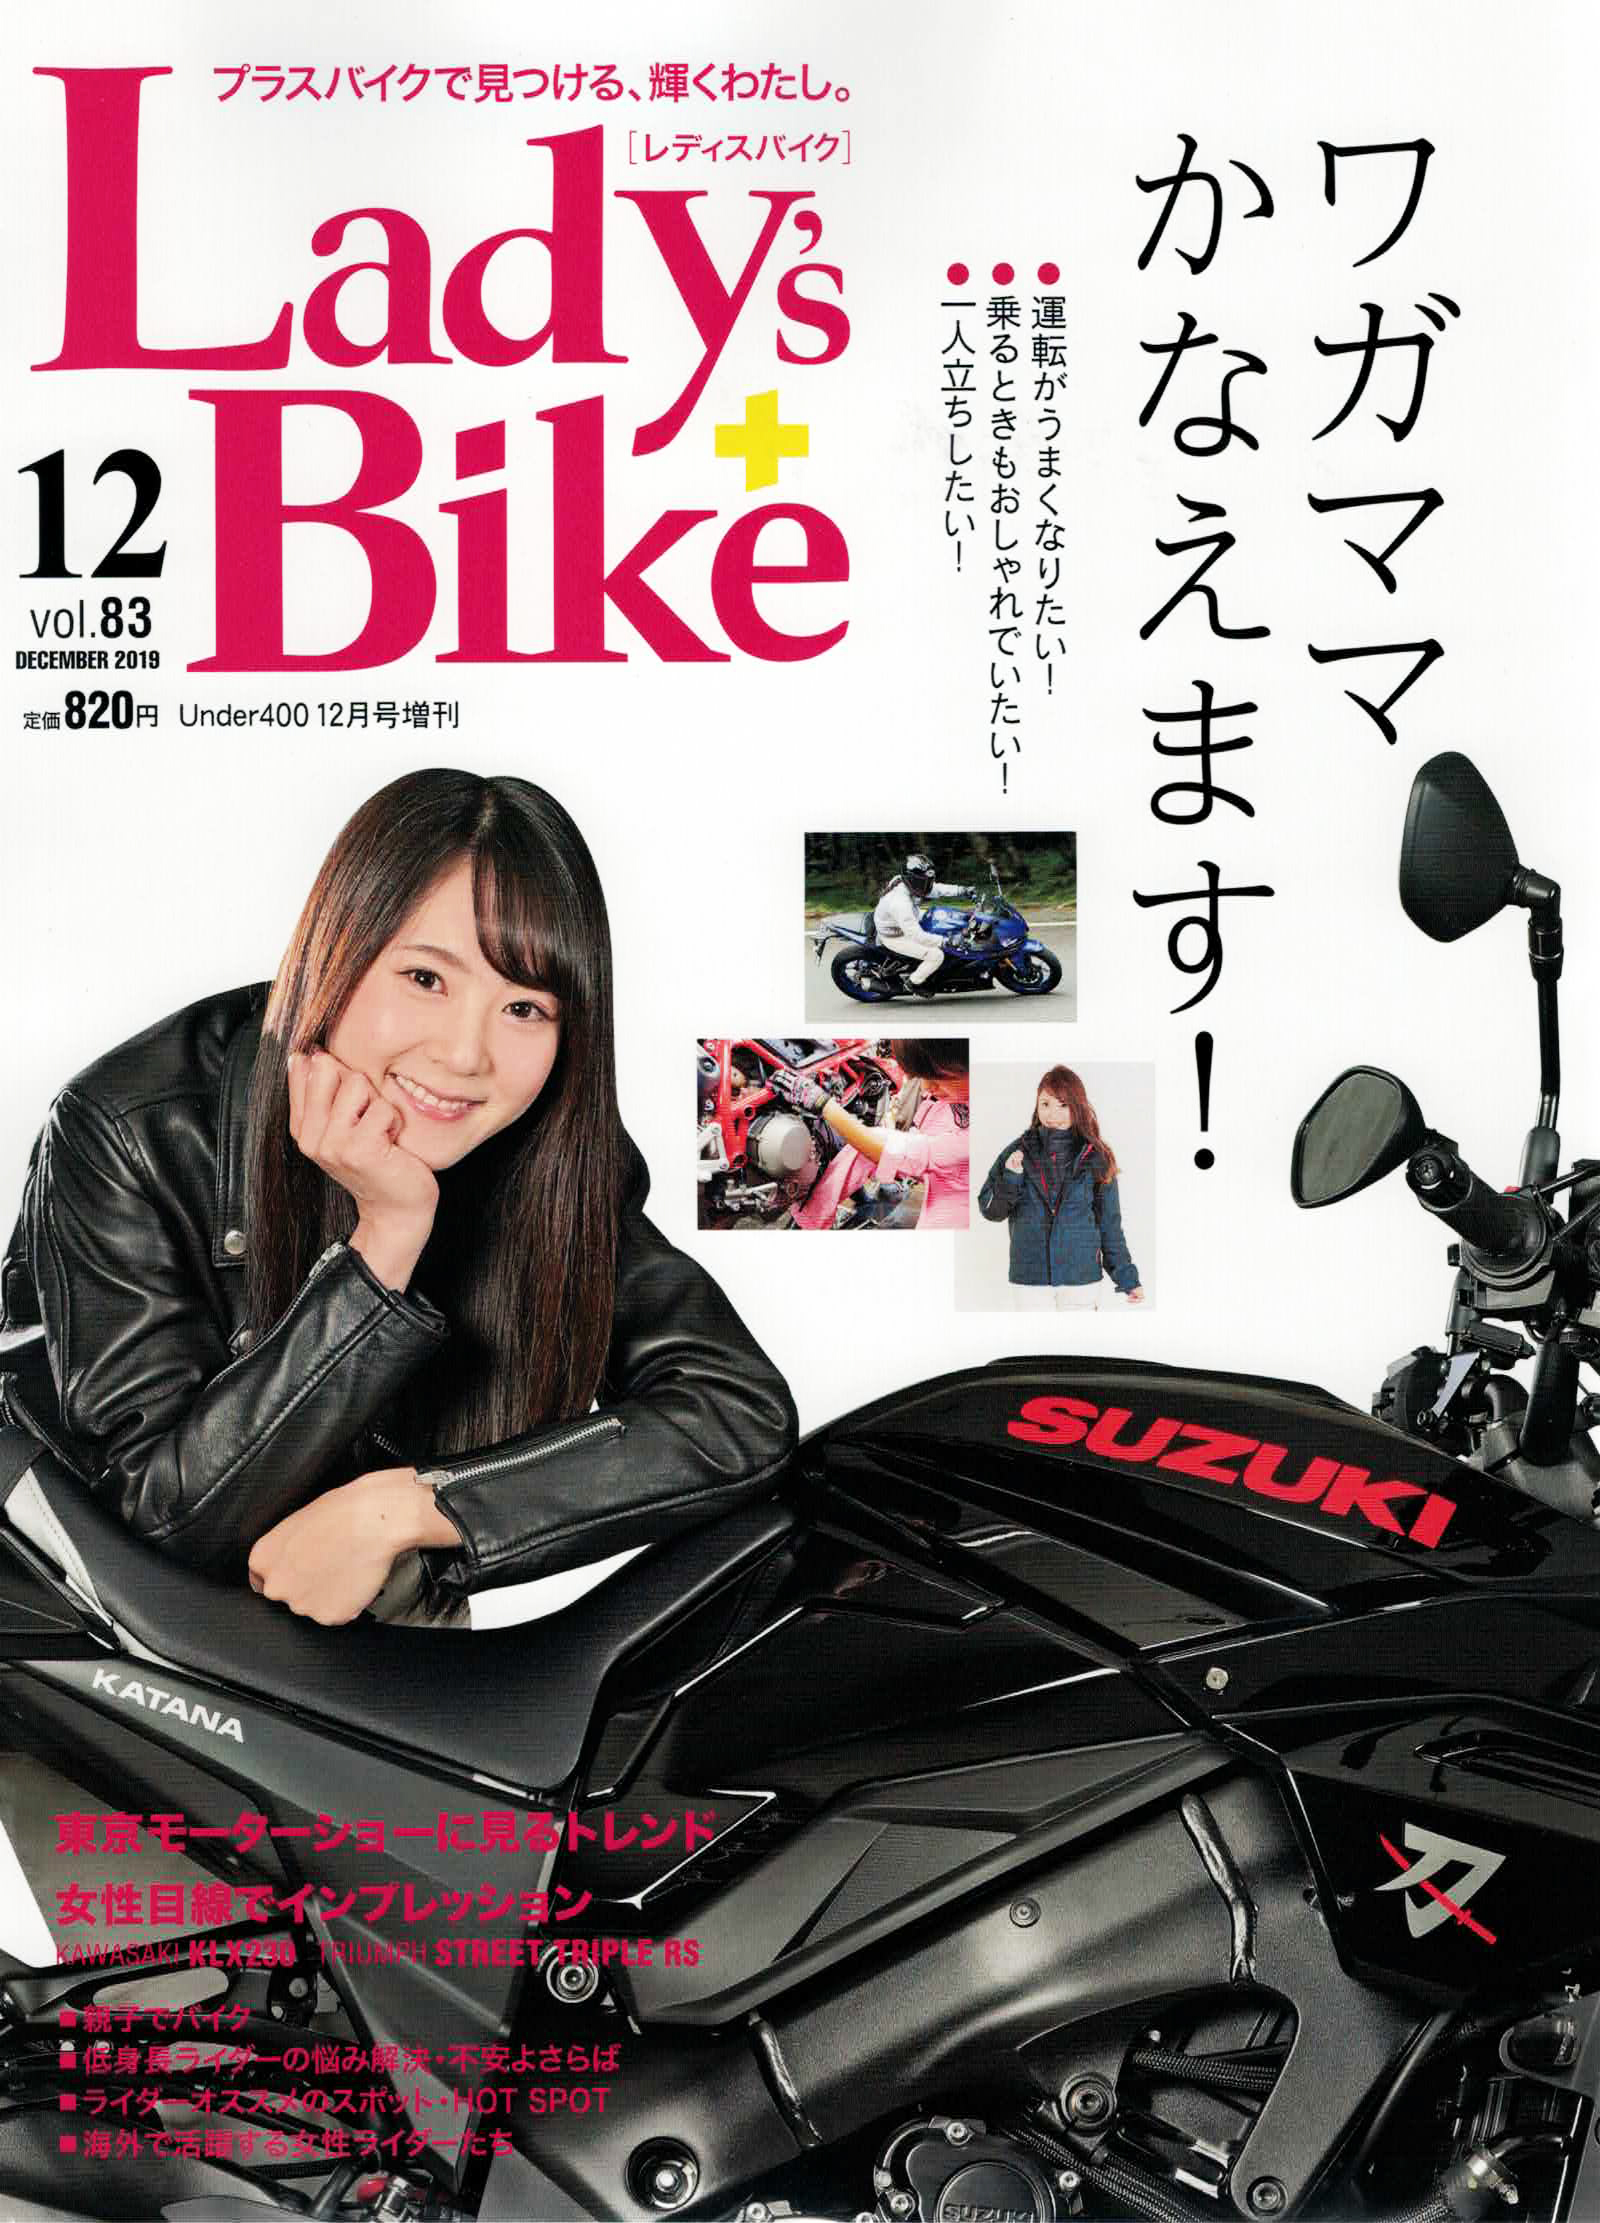 【Lady's Bike12月号掲載】PANDO MOTO